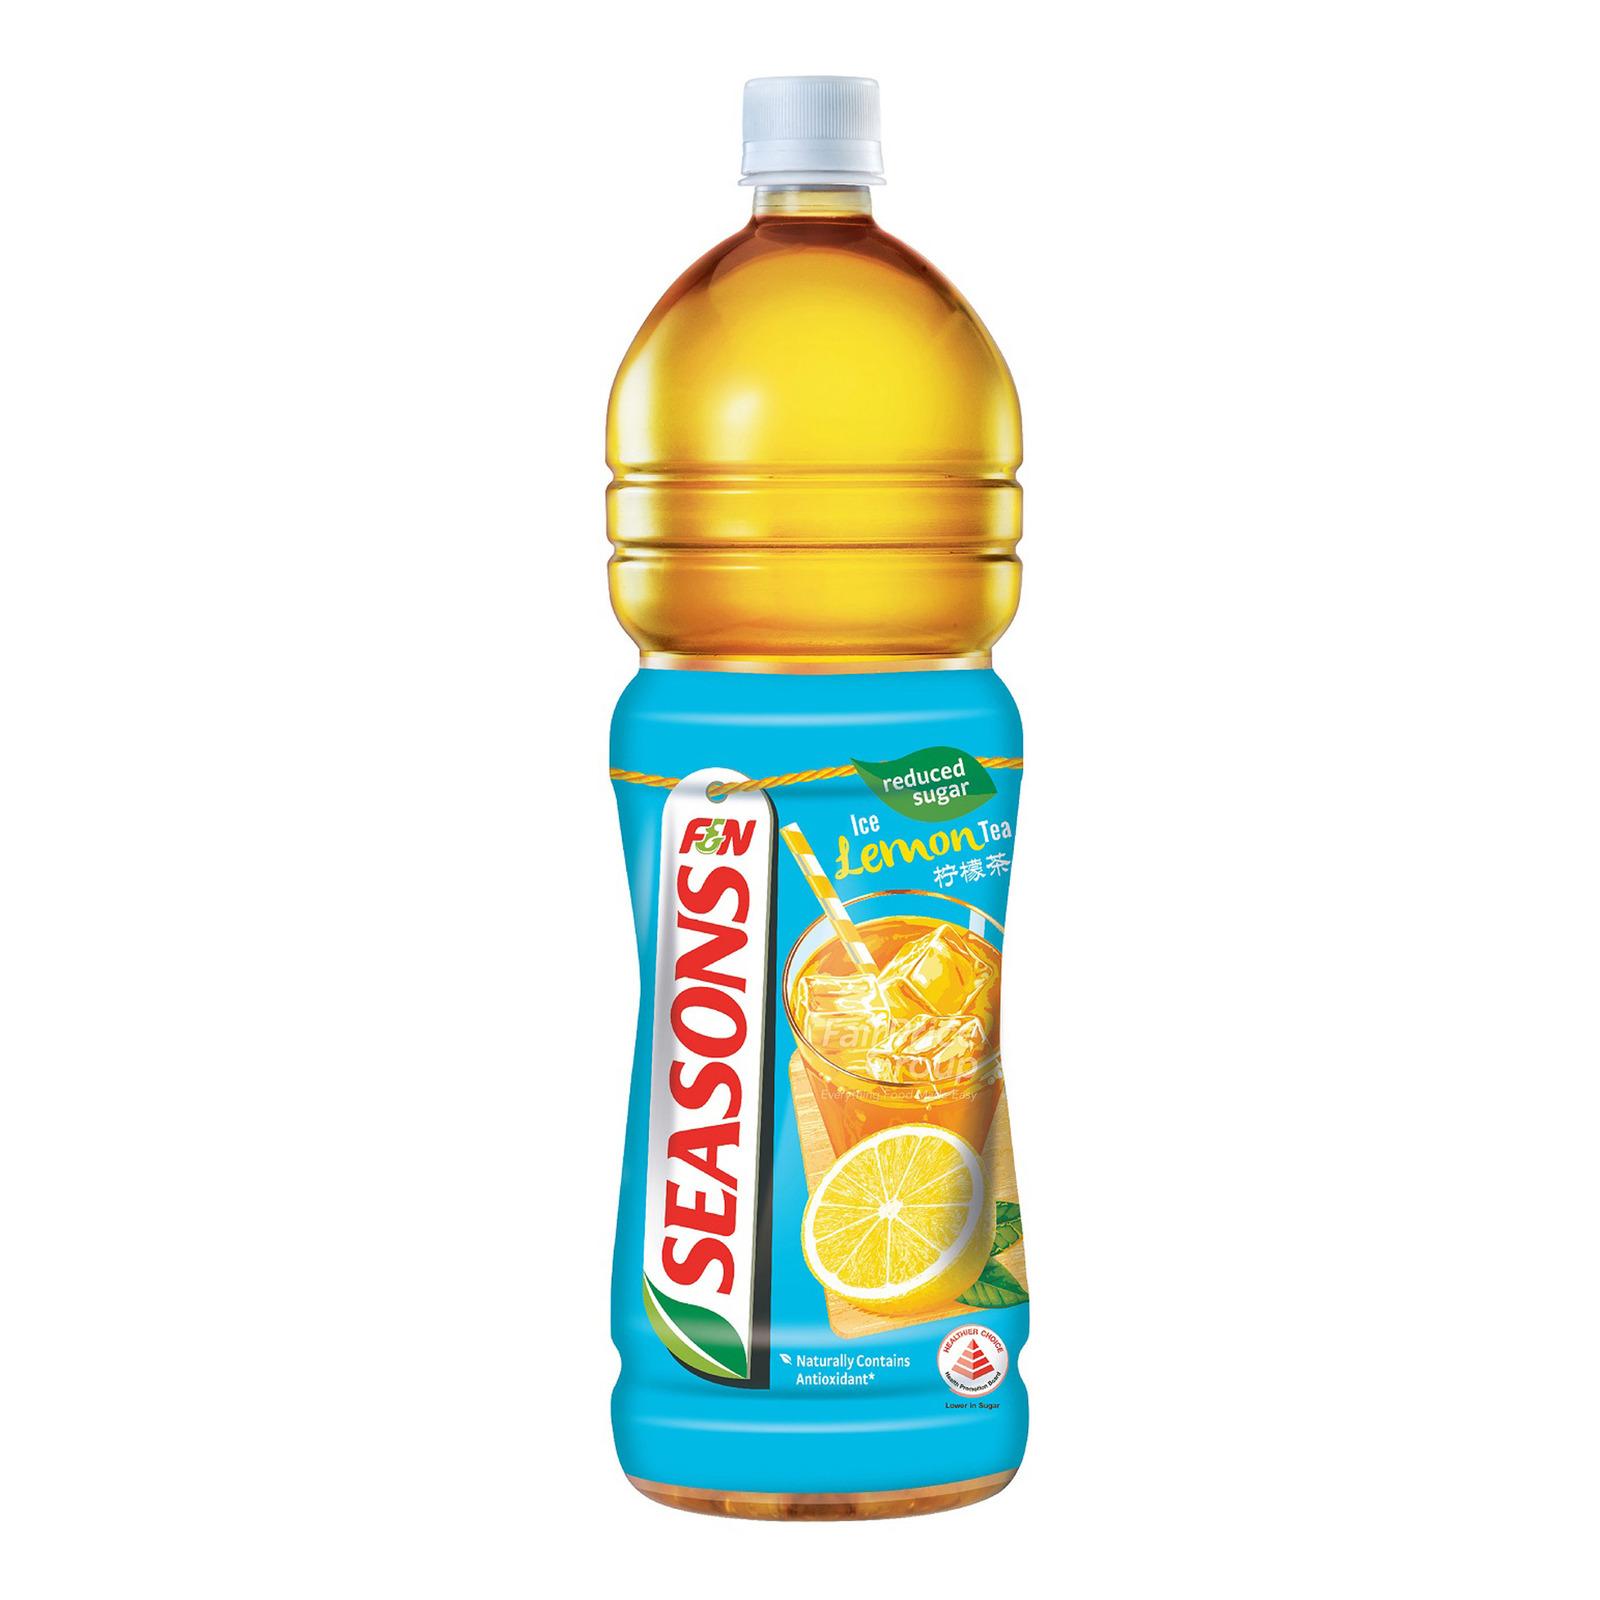 F&N Seasons Bottle Drink- Ice Lemon Tea (Reduced Sugar)